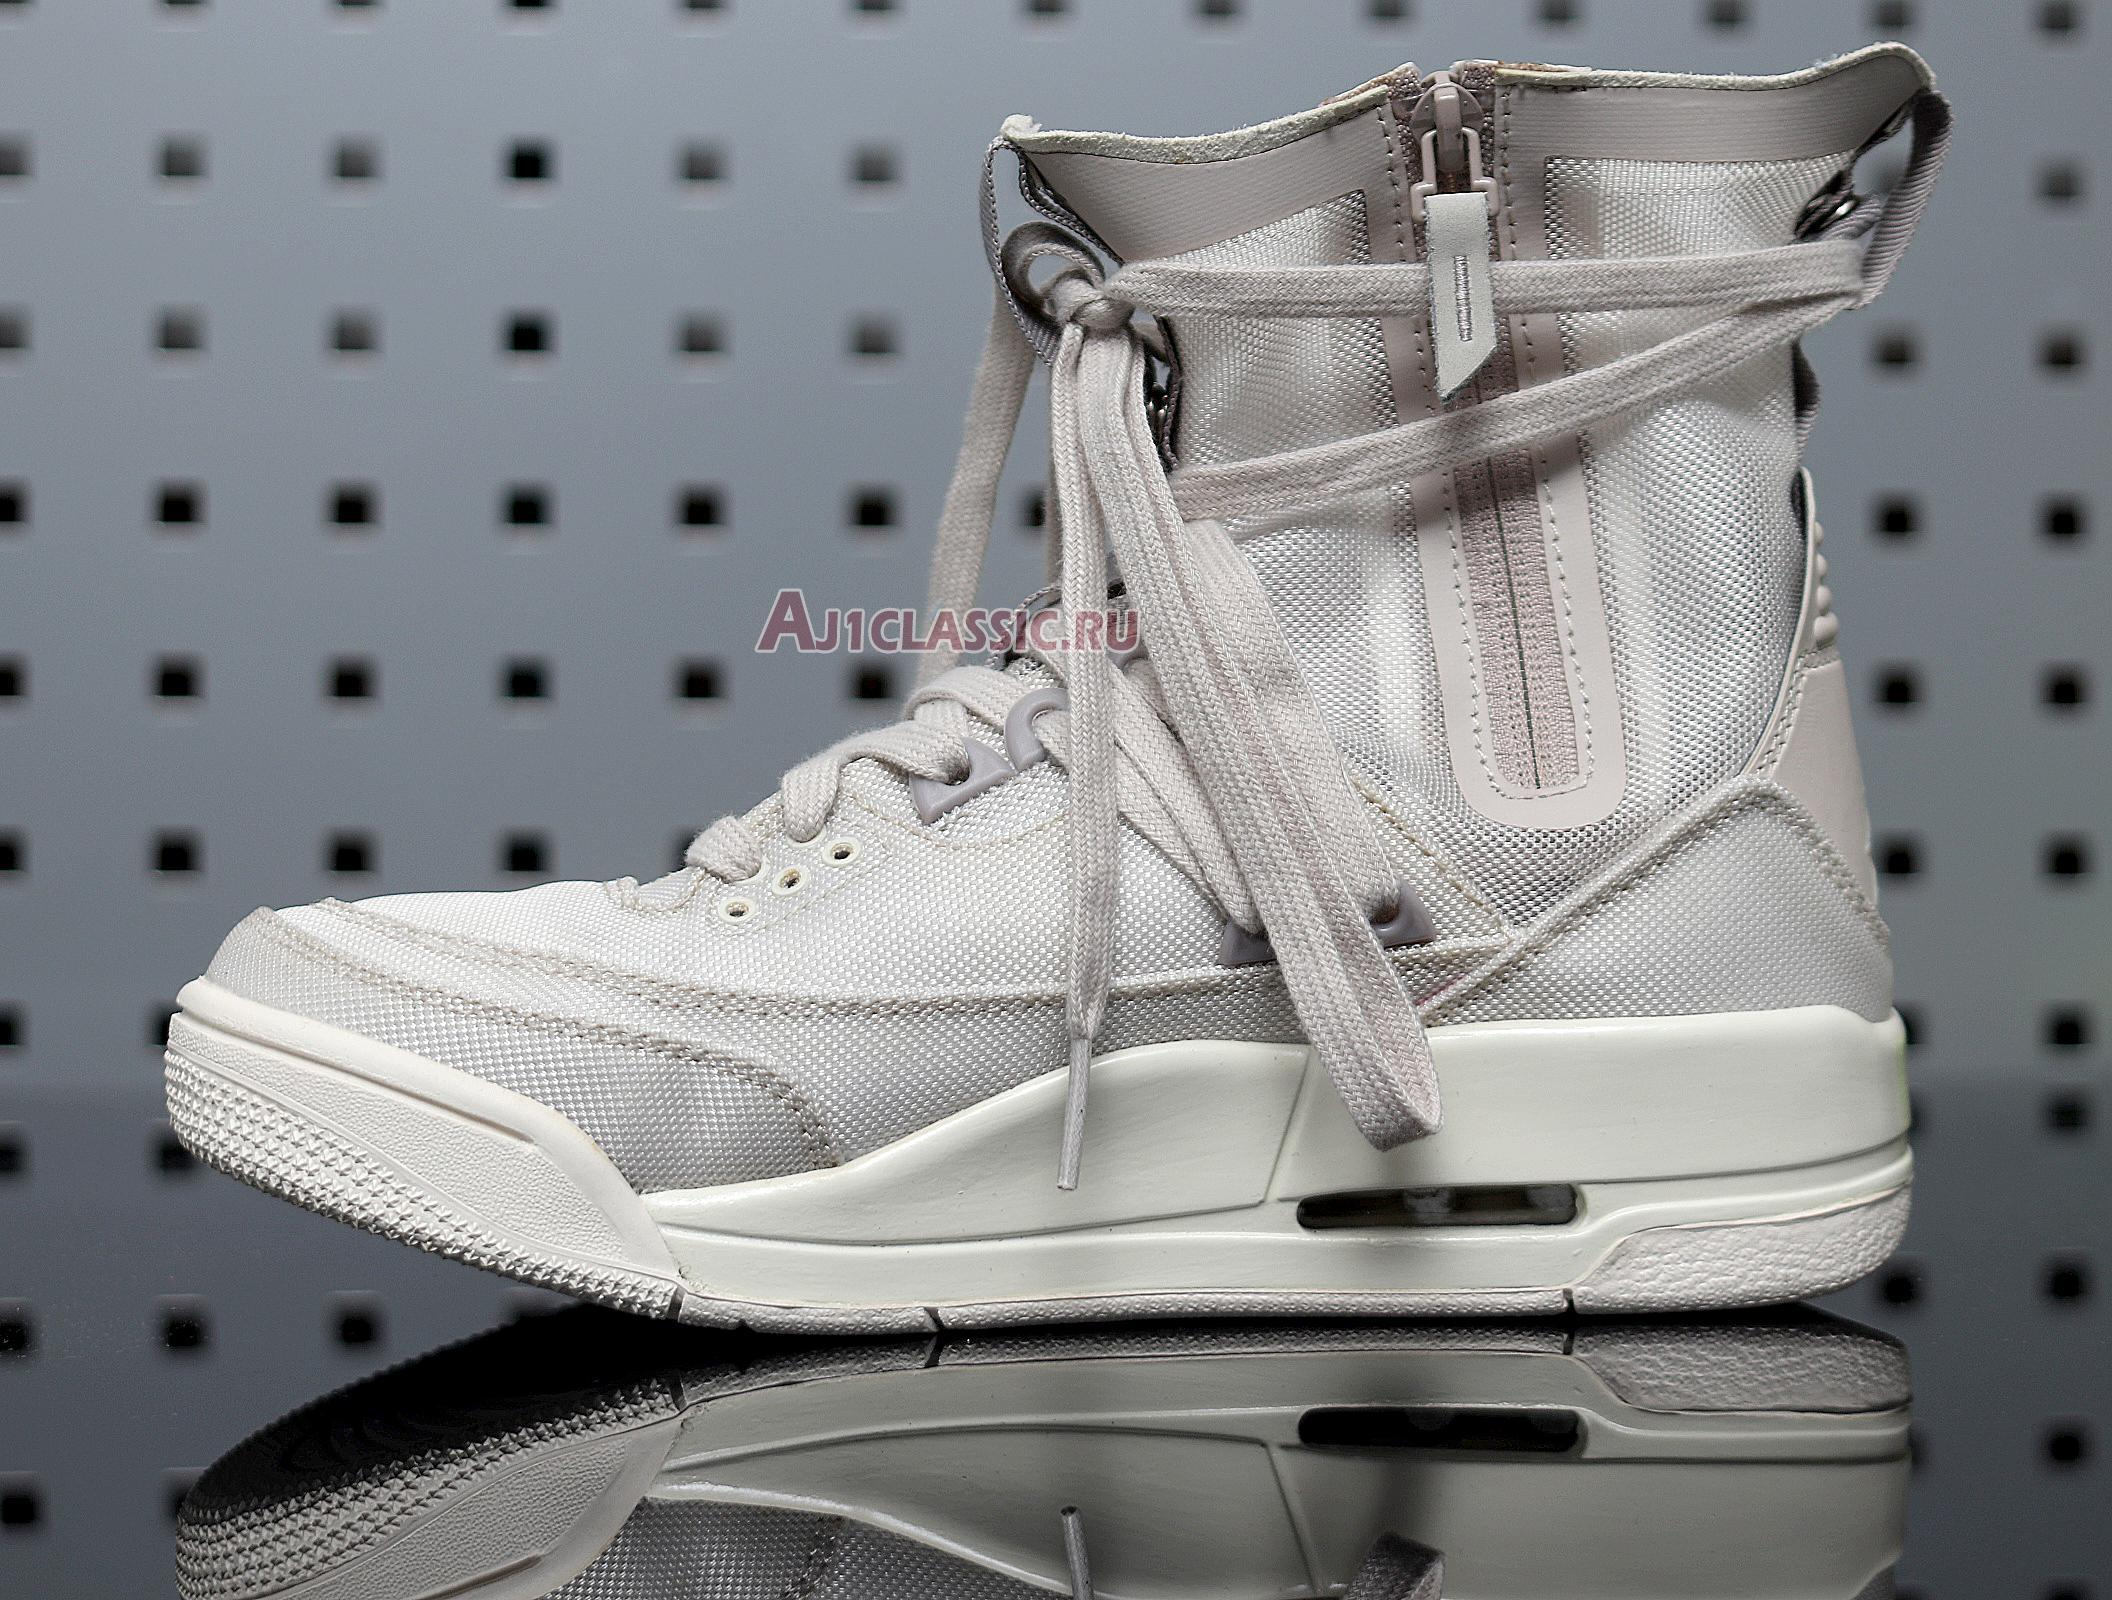 Air Jordan 3 RTR EXP Lite BQ8394-002